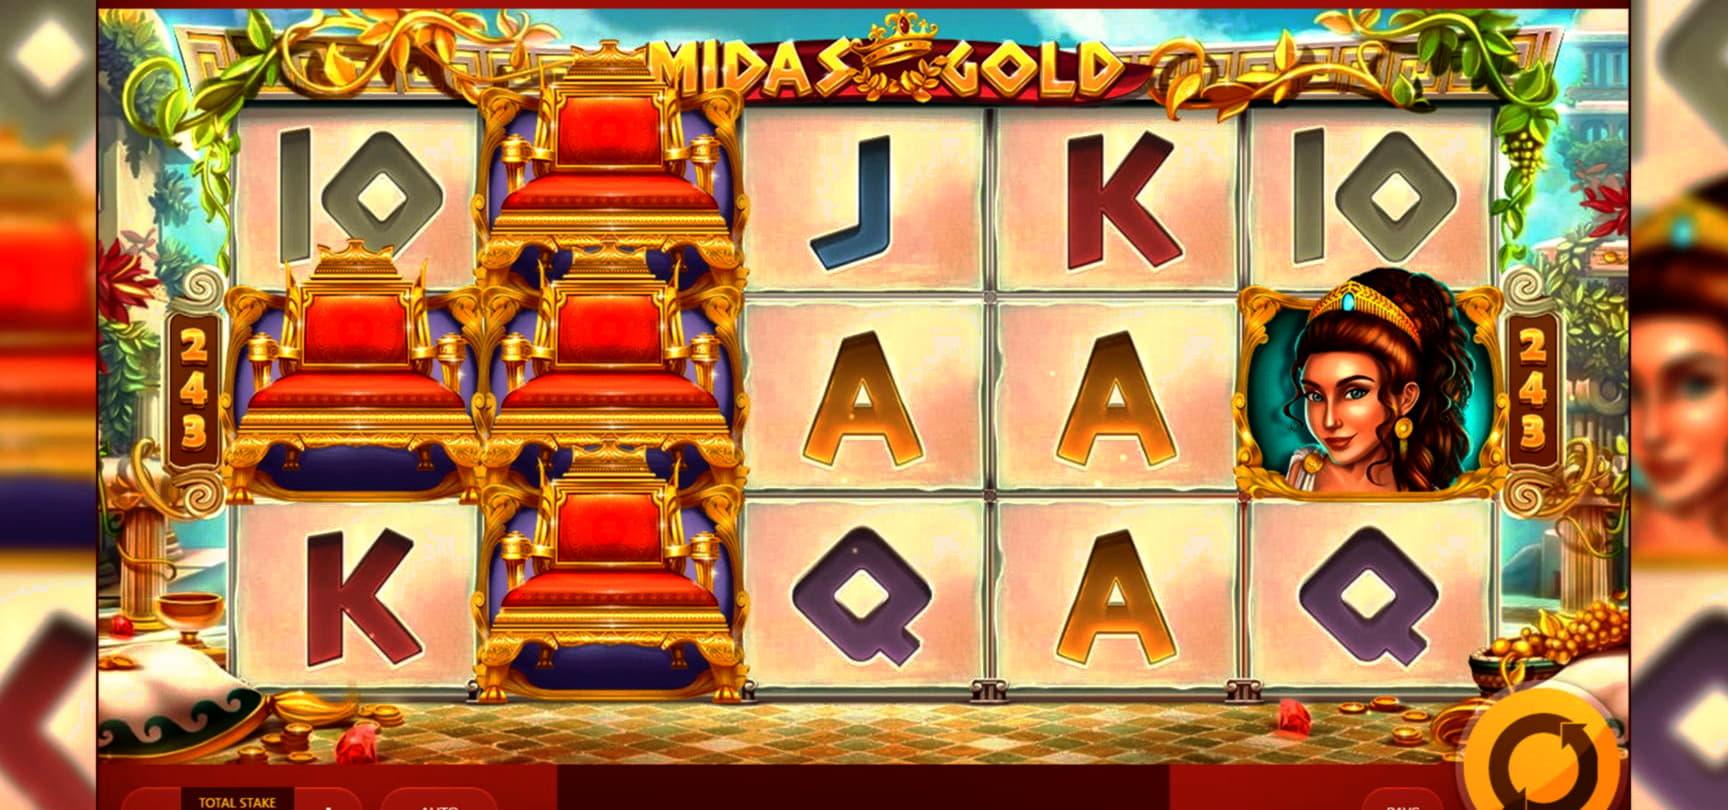 955% Casino match bonus at Spinrider Casino